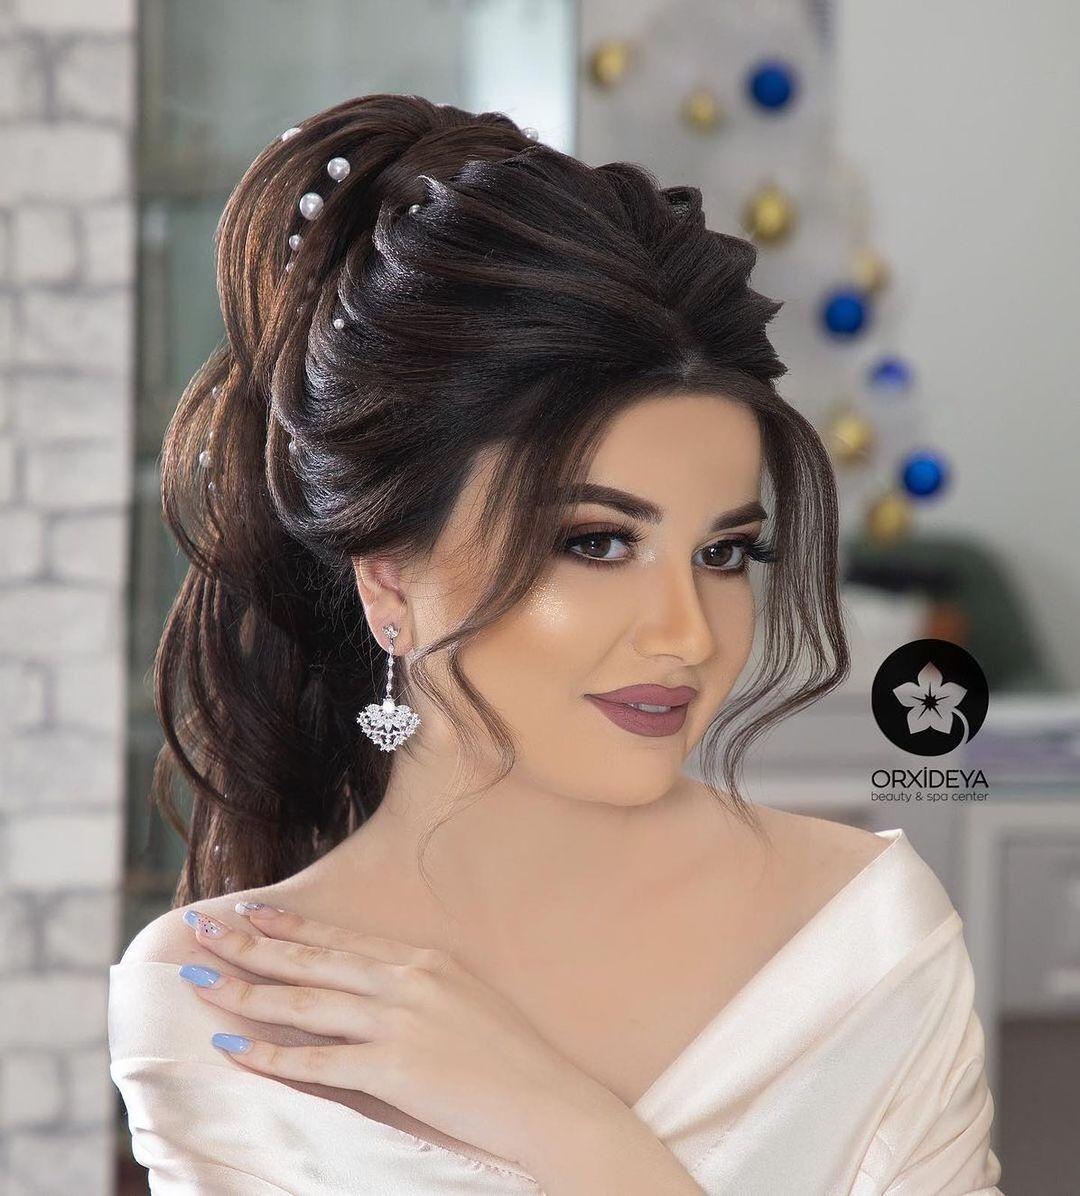 Gelin Sac Makiyaj Wedding Posted On Instagram Sac Duzumu Gunay Jabrailova Makiyaj Aynur Hesenli Diqqet In 2021 Hair Beauty Beauty Wedding Hairstyles